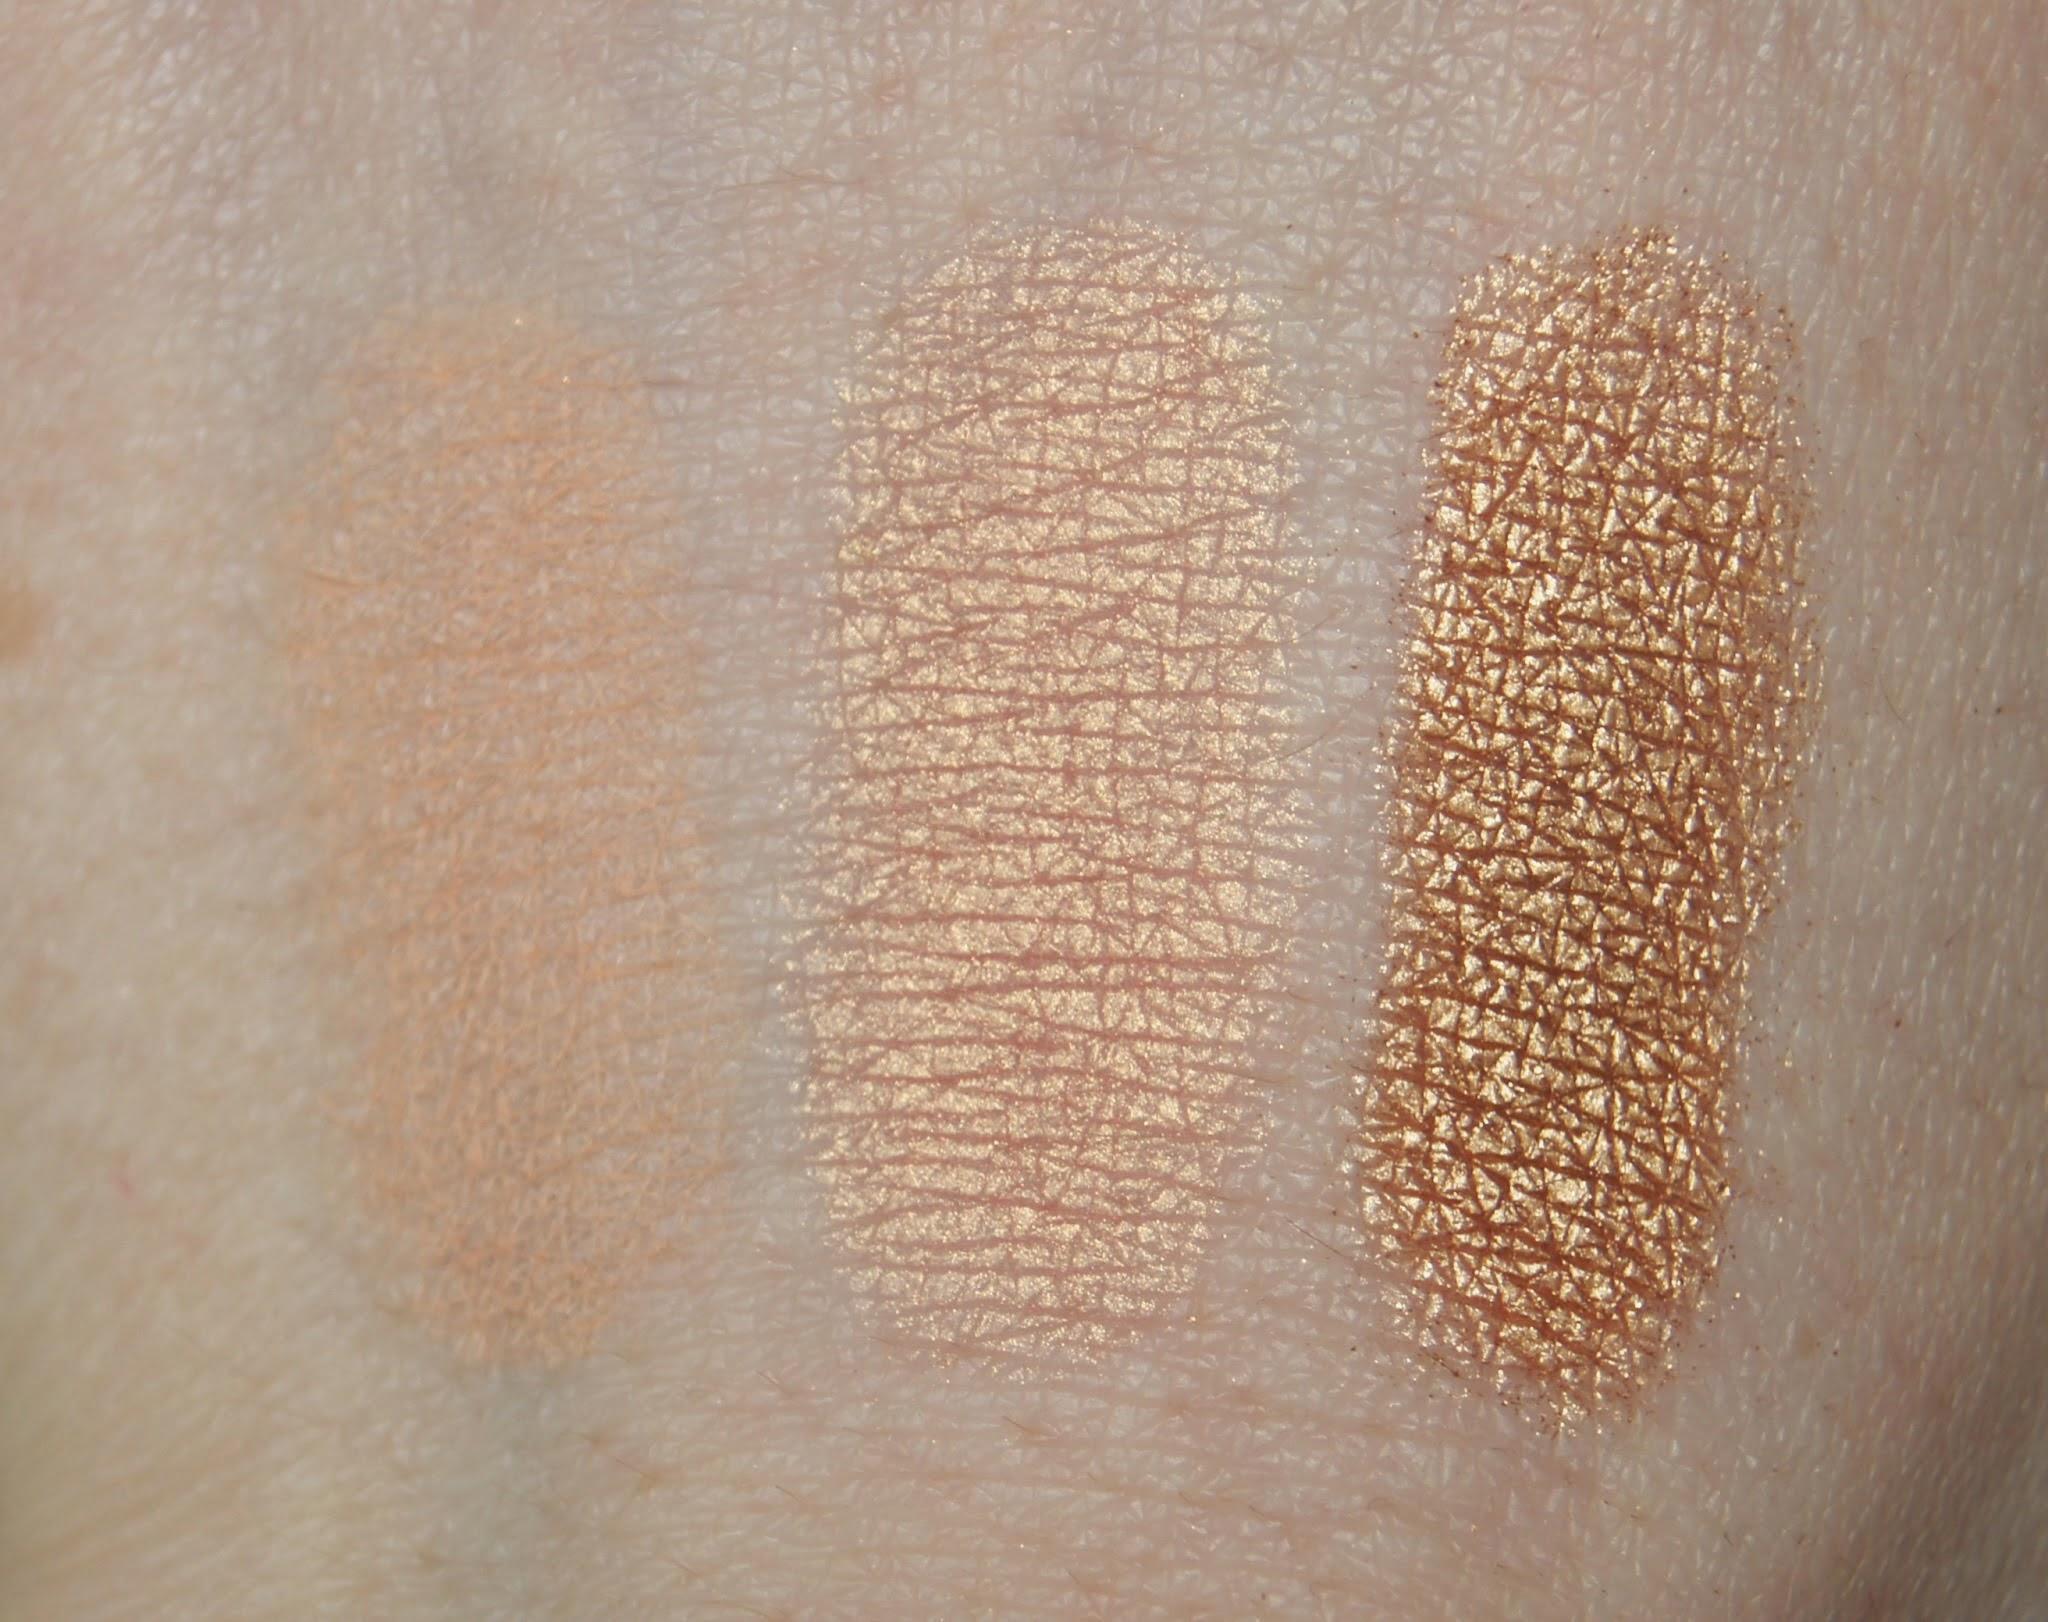 Smashbox Eyeshadow Swatches Bare, Peach & Gold